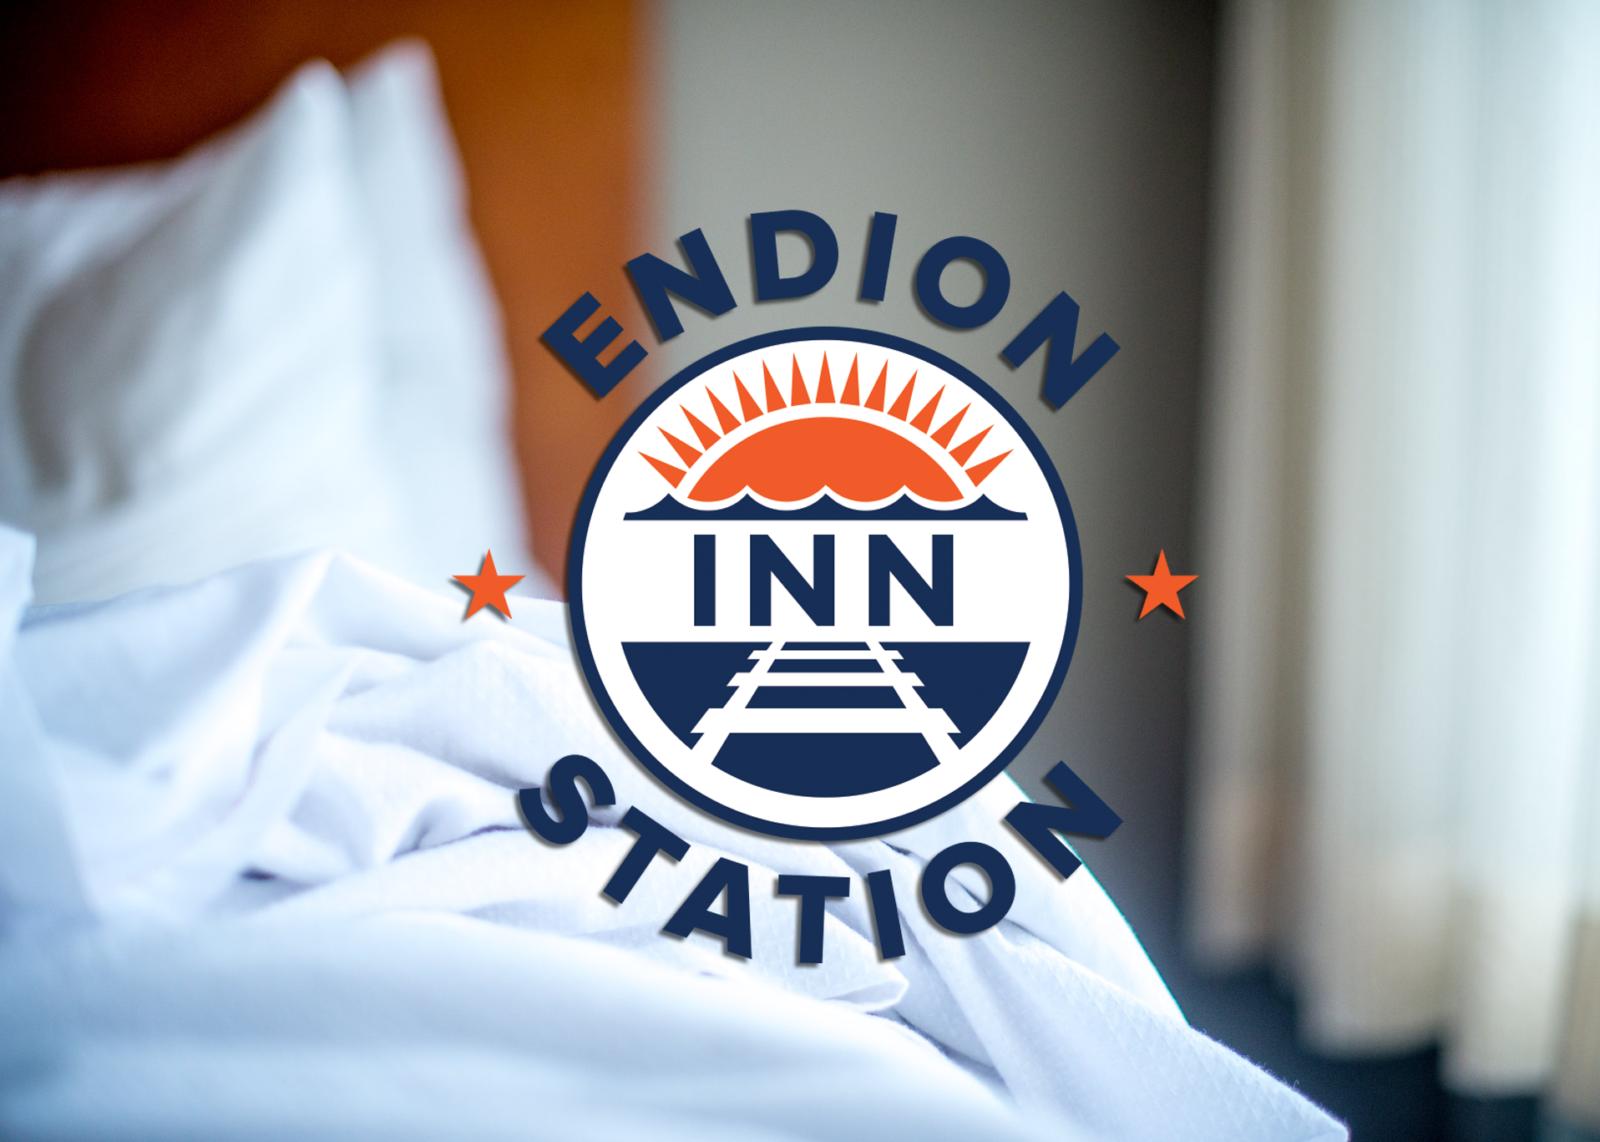 Endion Inn Hotel Canal Park Duluth MN